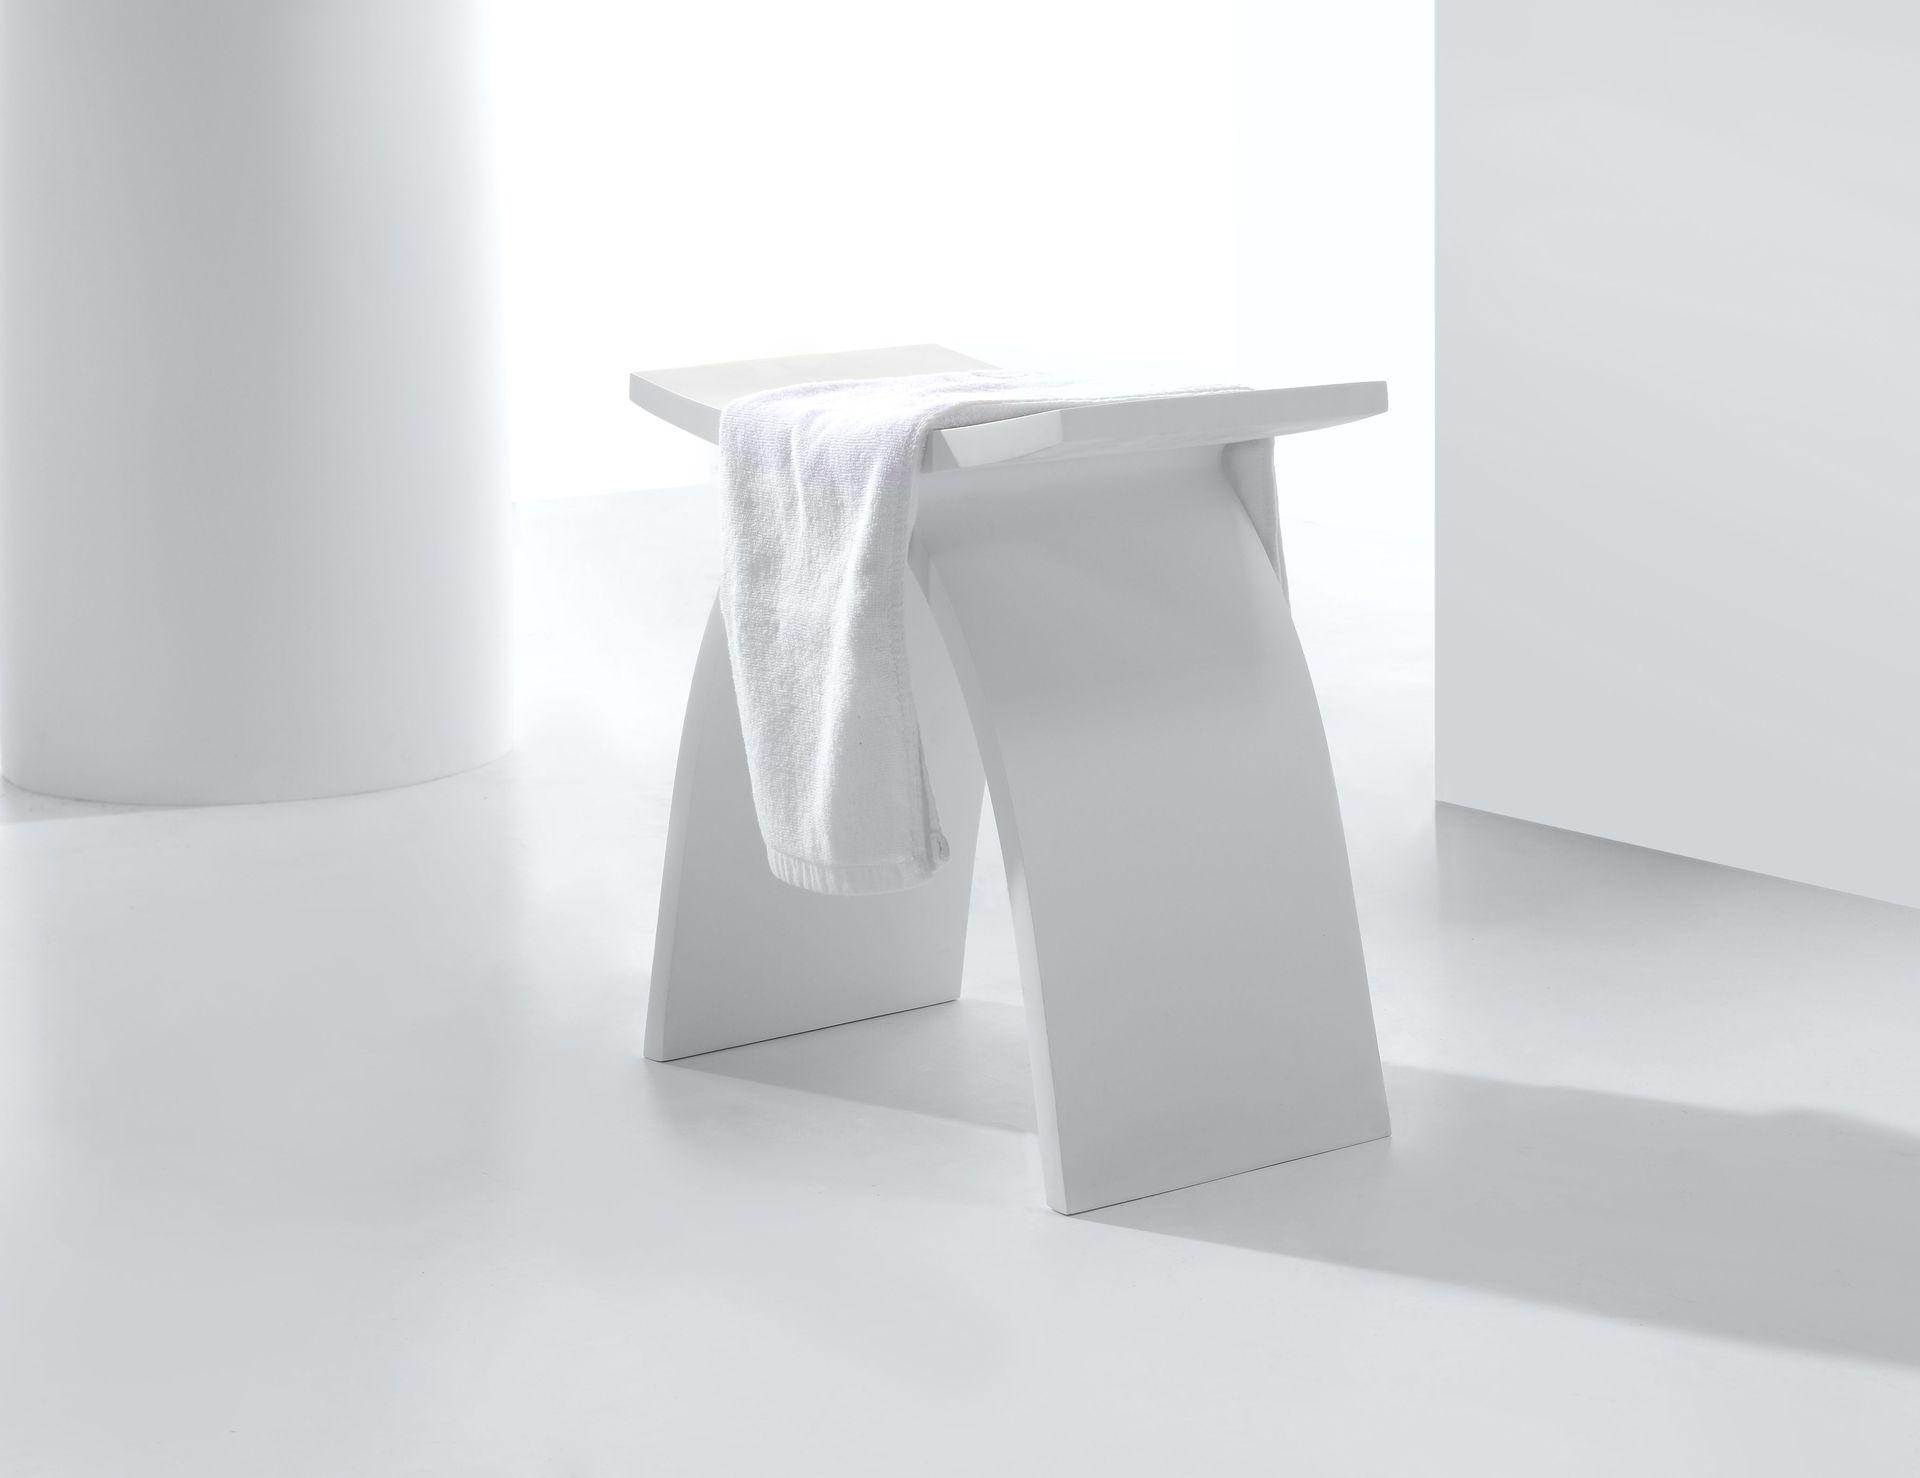 Solid Surface Badkamer : Solid surface hocker design in uw badkamer douchecabine